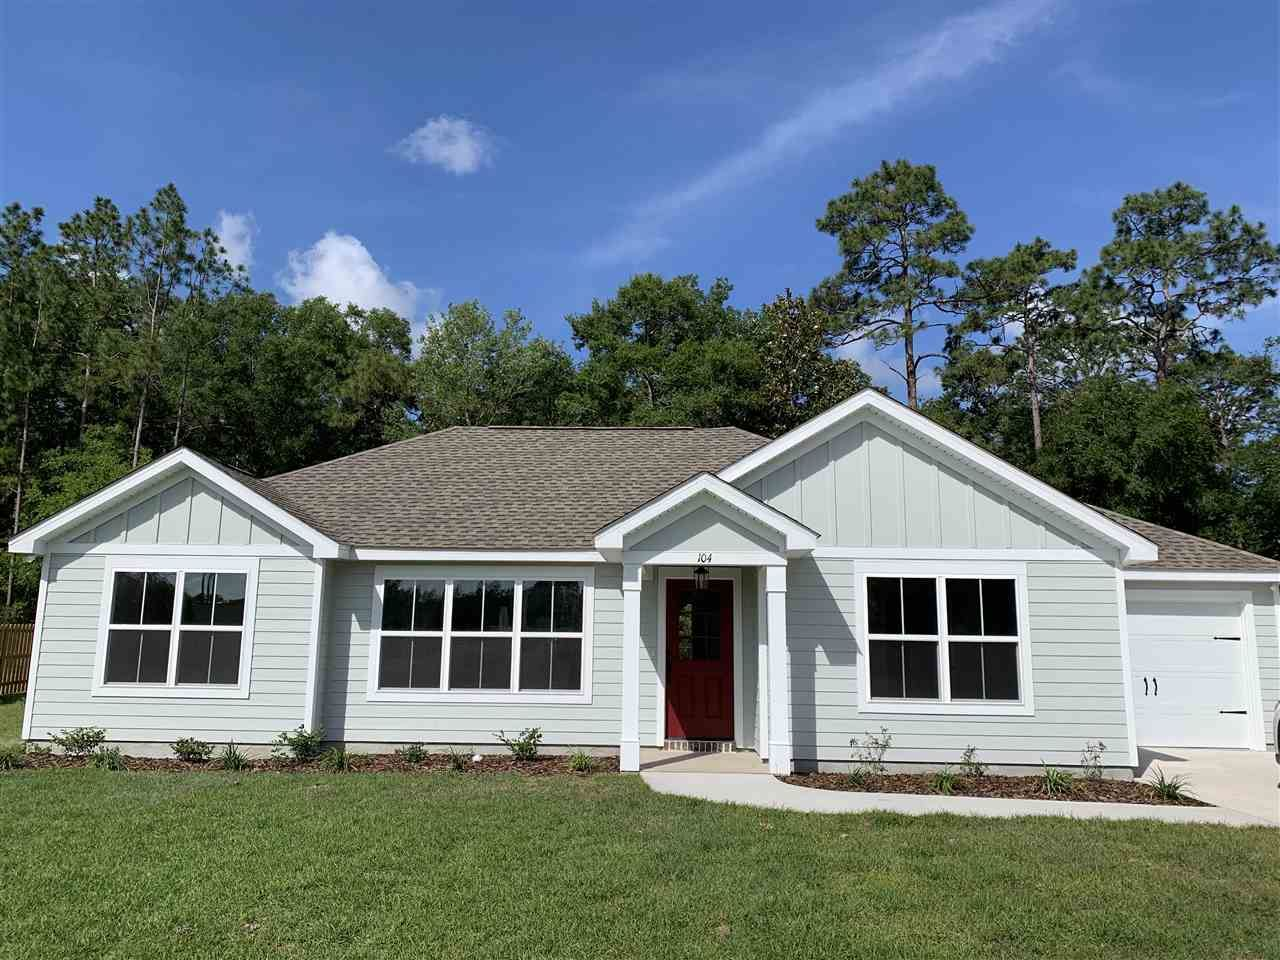 72 Wigeon Way, Crawfordville, FL 32327 - MLS#: 319277